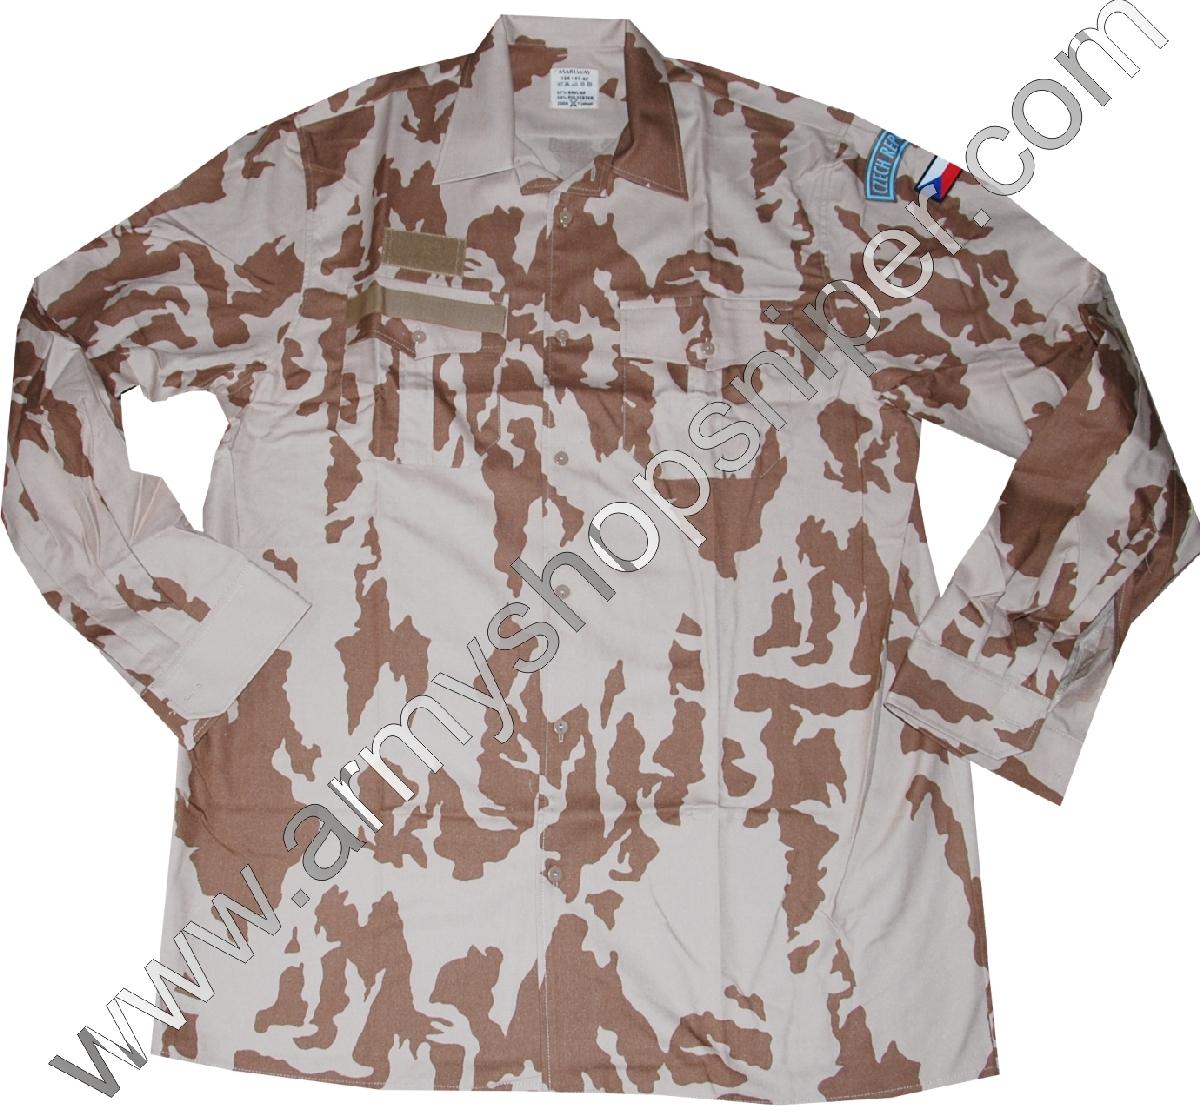 Košile AČR 2000 desert